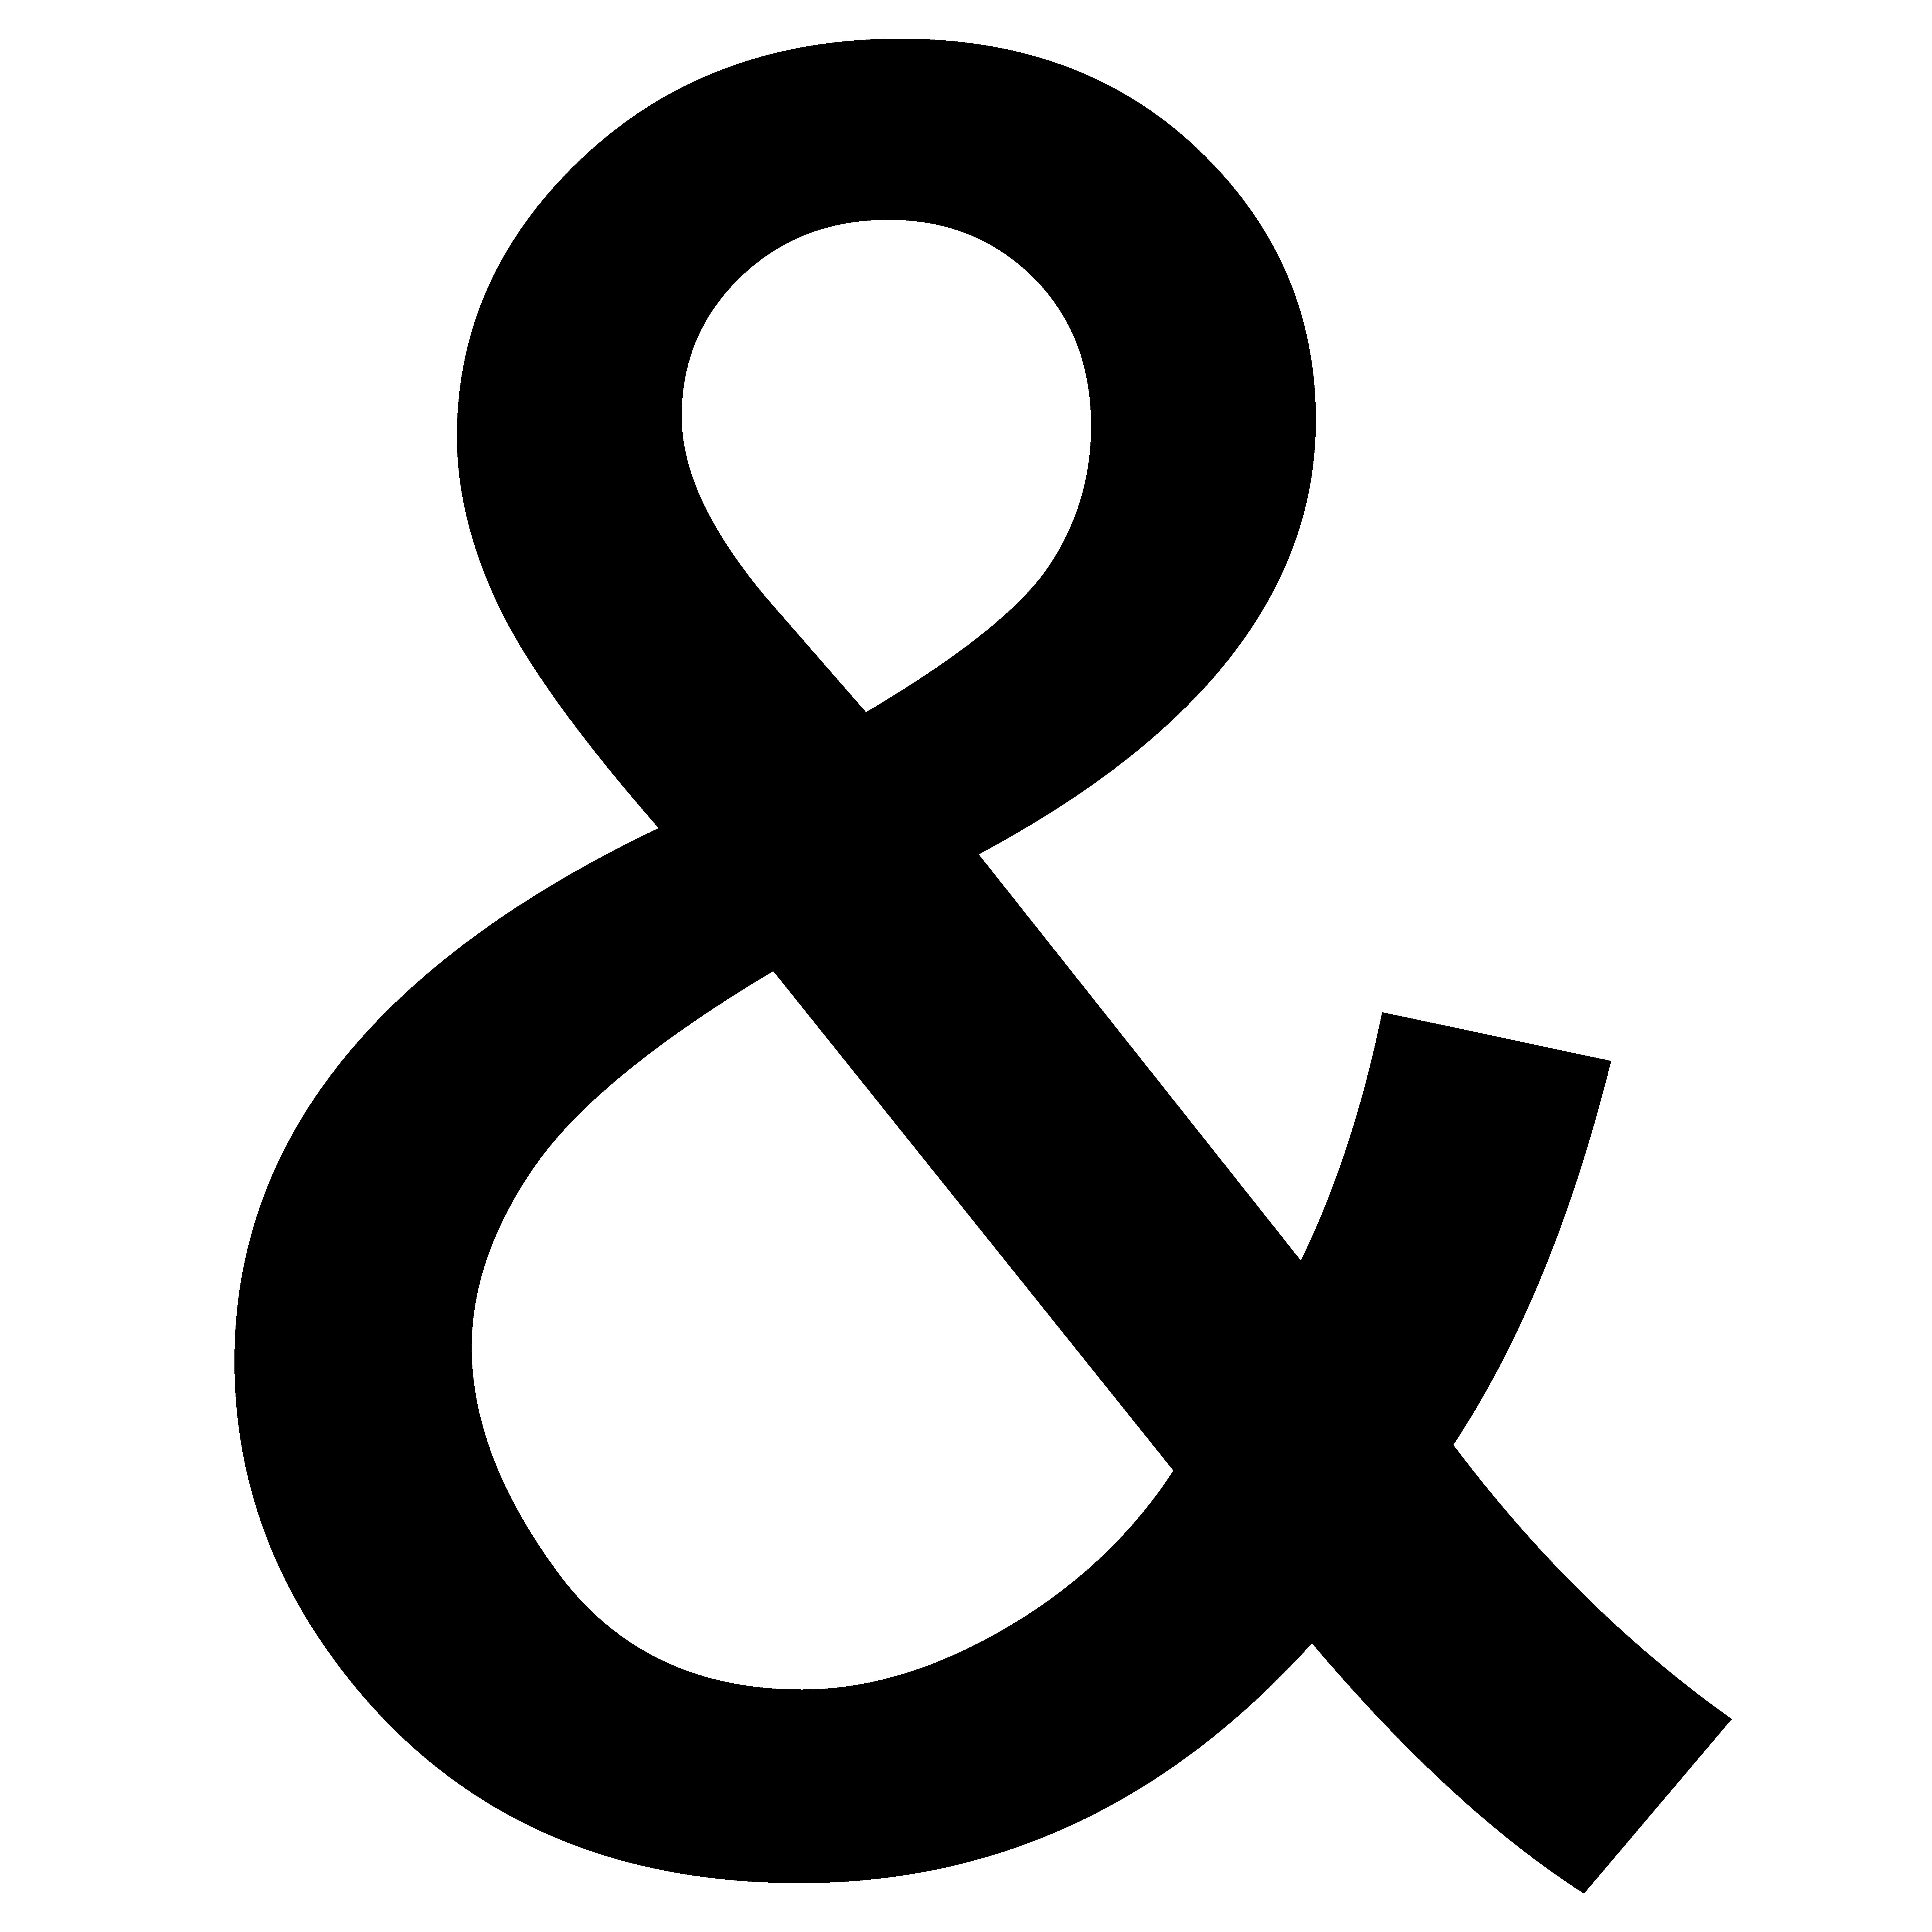 Ampersand (&)